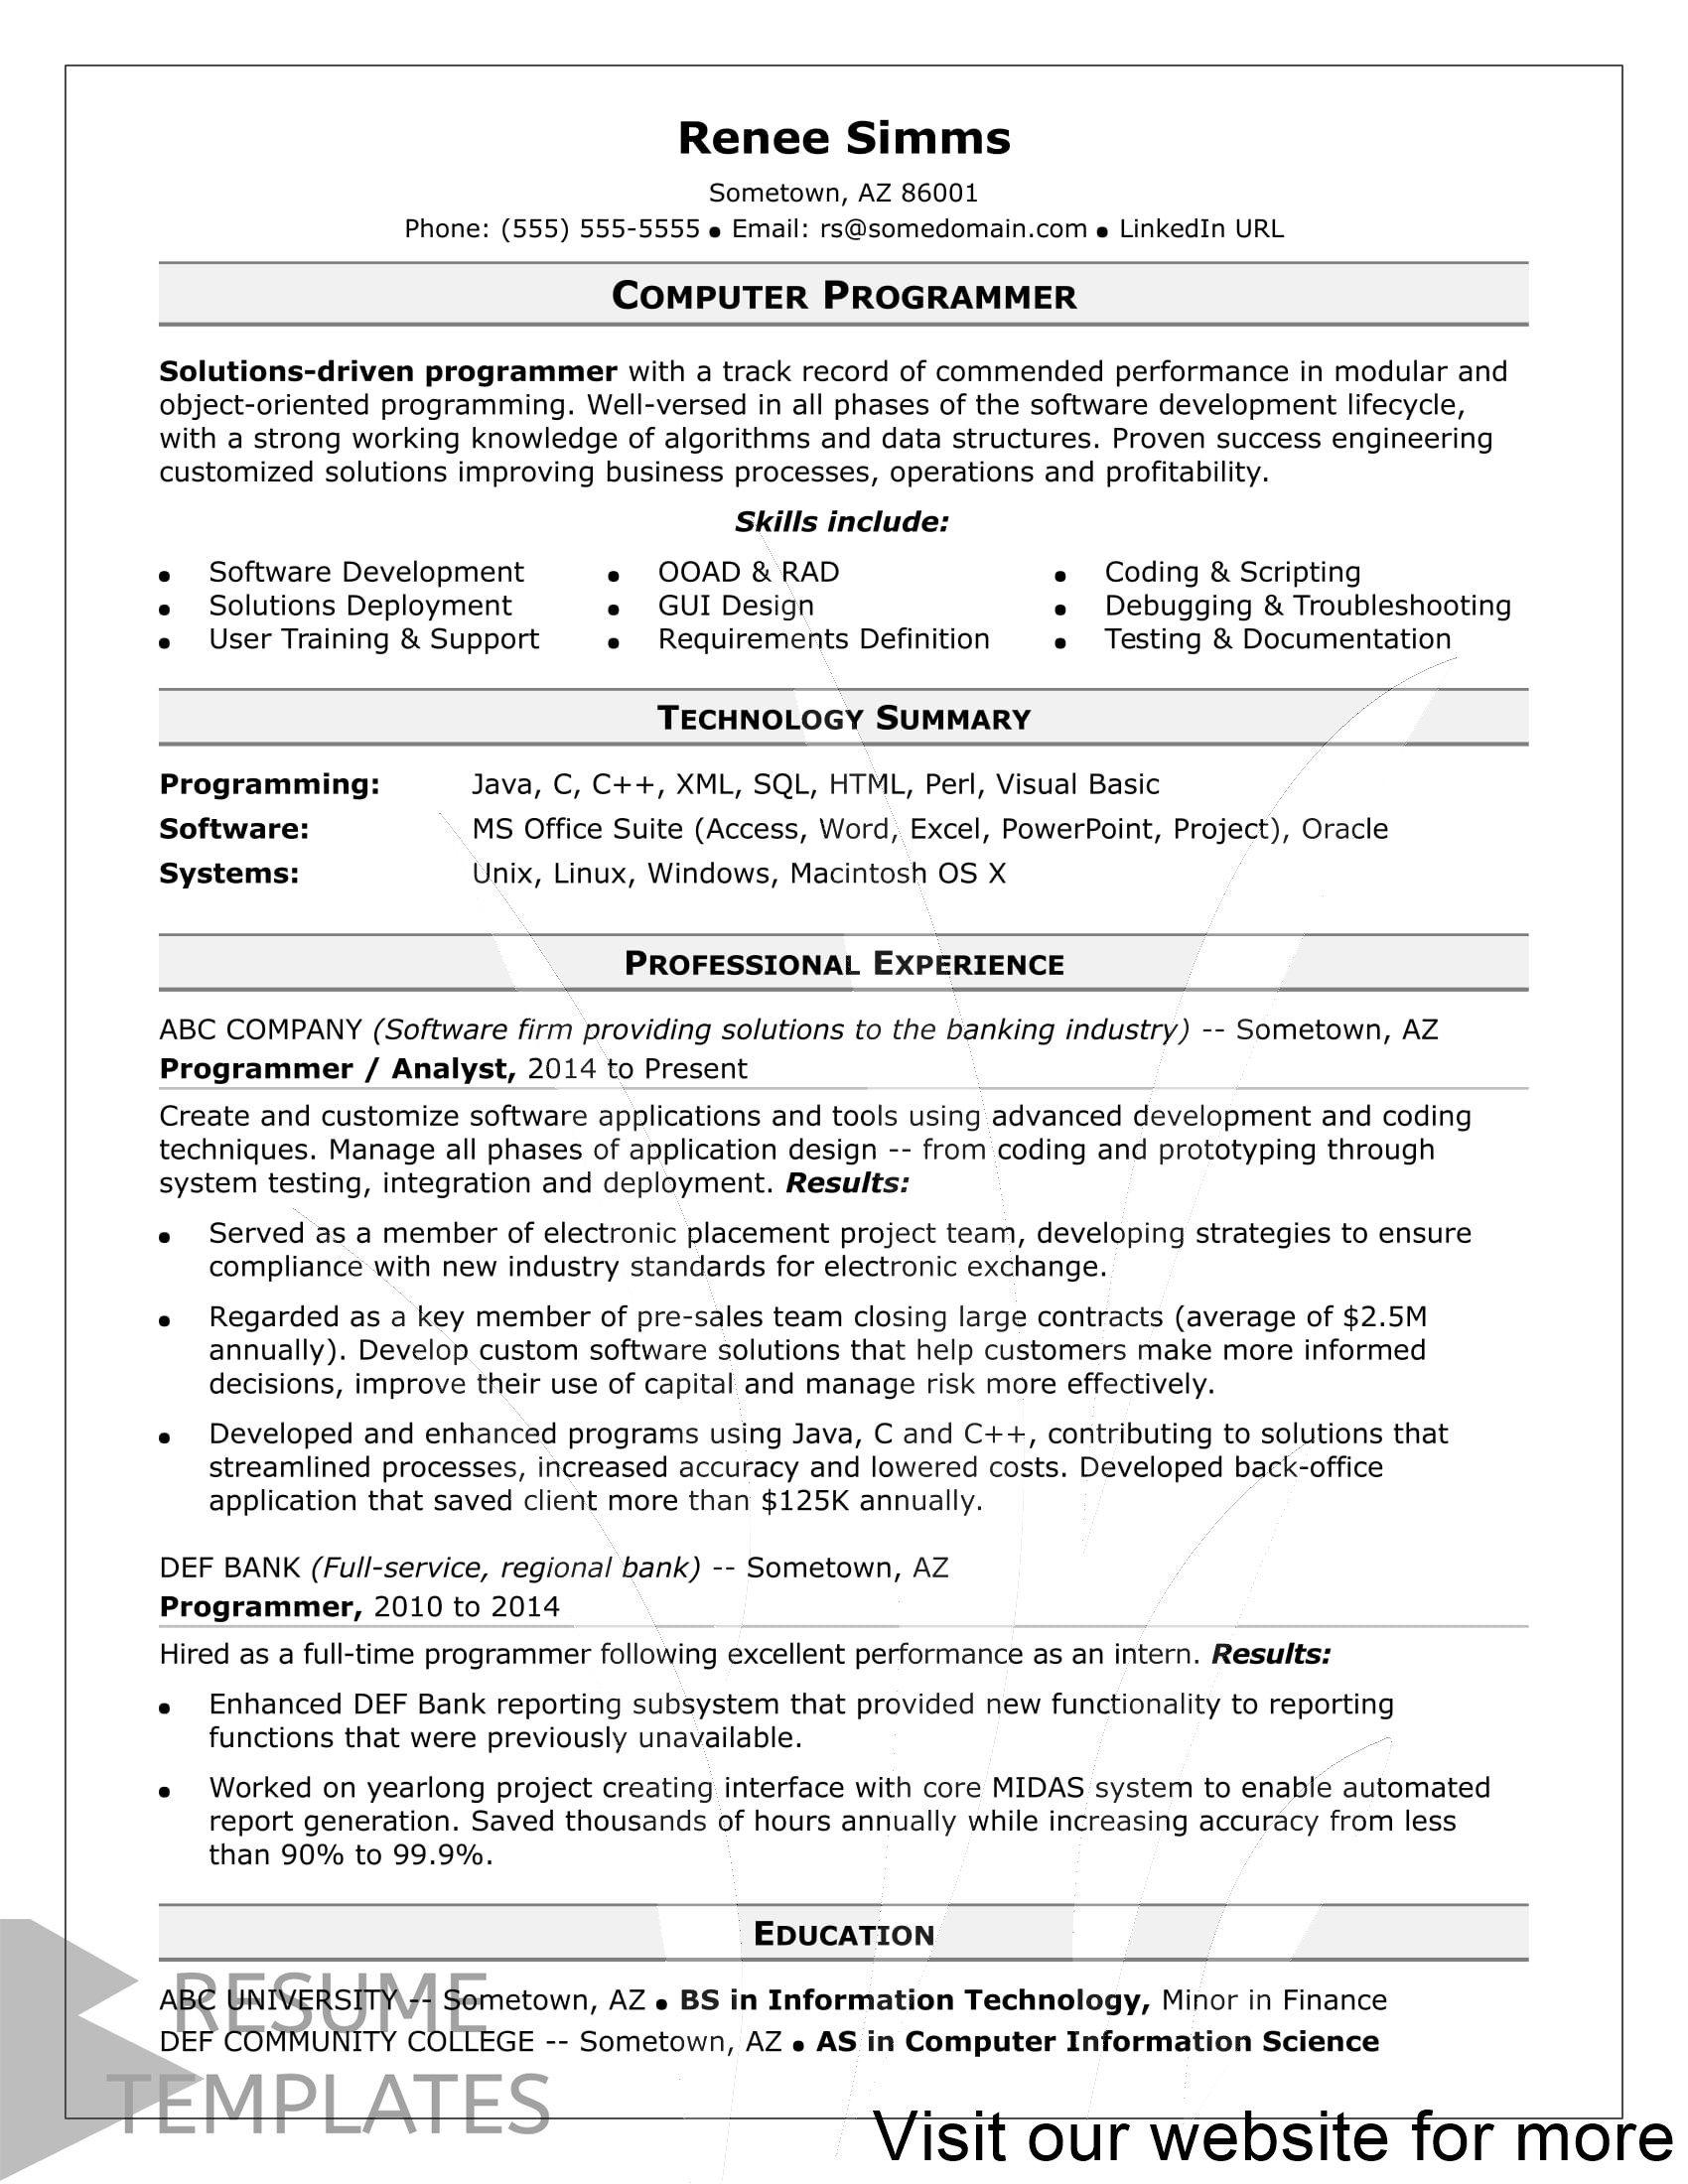 Resume Builder App Free Cv Maker Cv Templates 2020 Computer Programmer Resume Job Resume Template